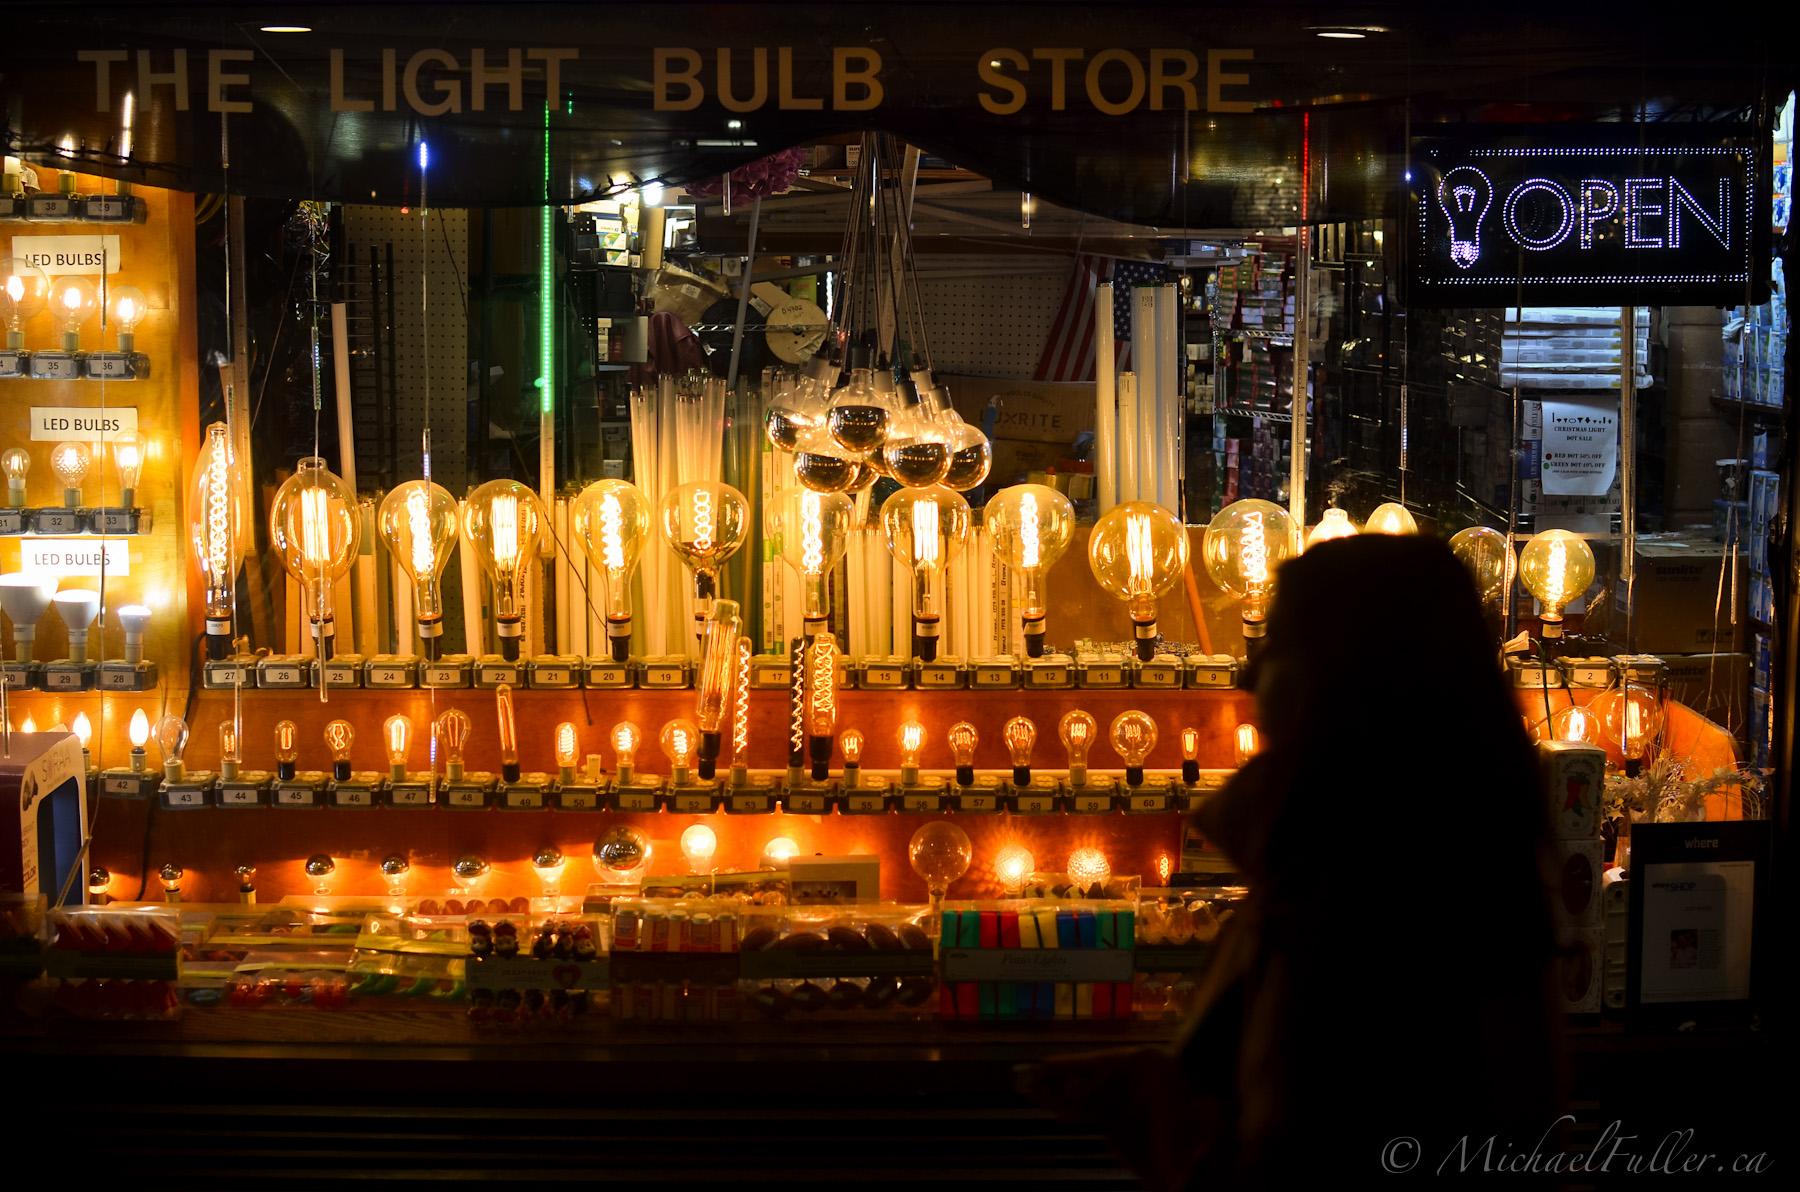 An illuminating storefront